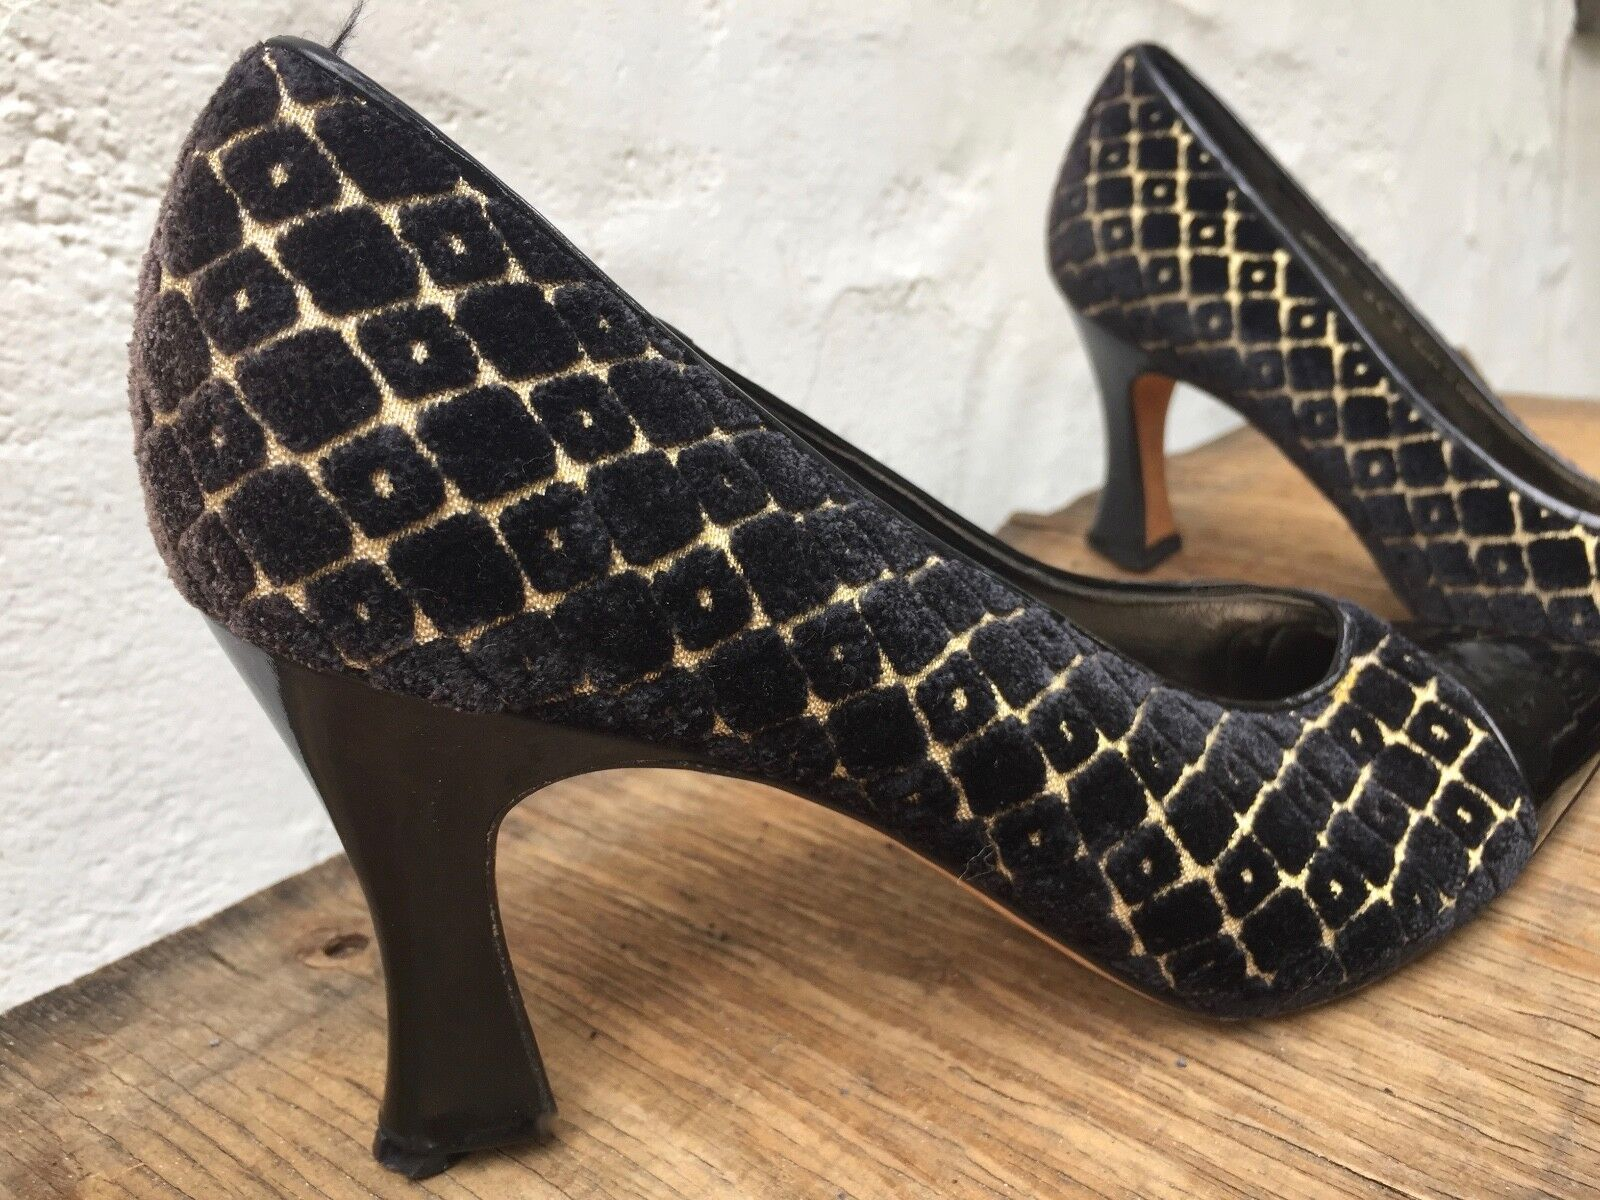 Vtg patent BALLY patent Vtg Leather & fabric Heel Classic Pumps Sz 8.5 N schwarz Gold  96080f